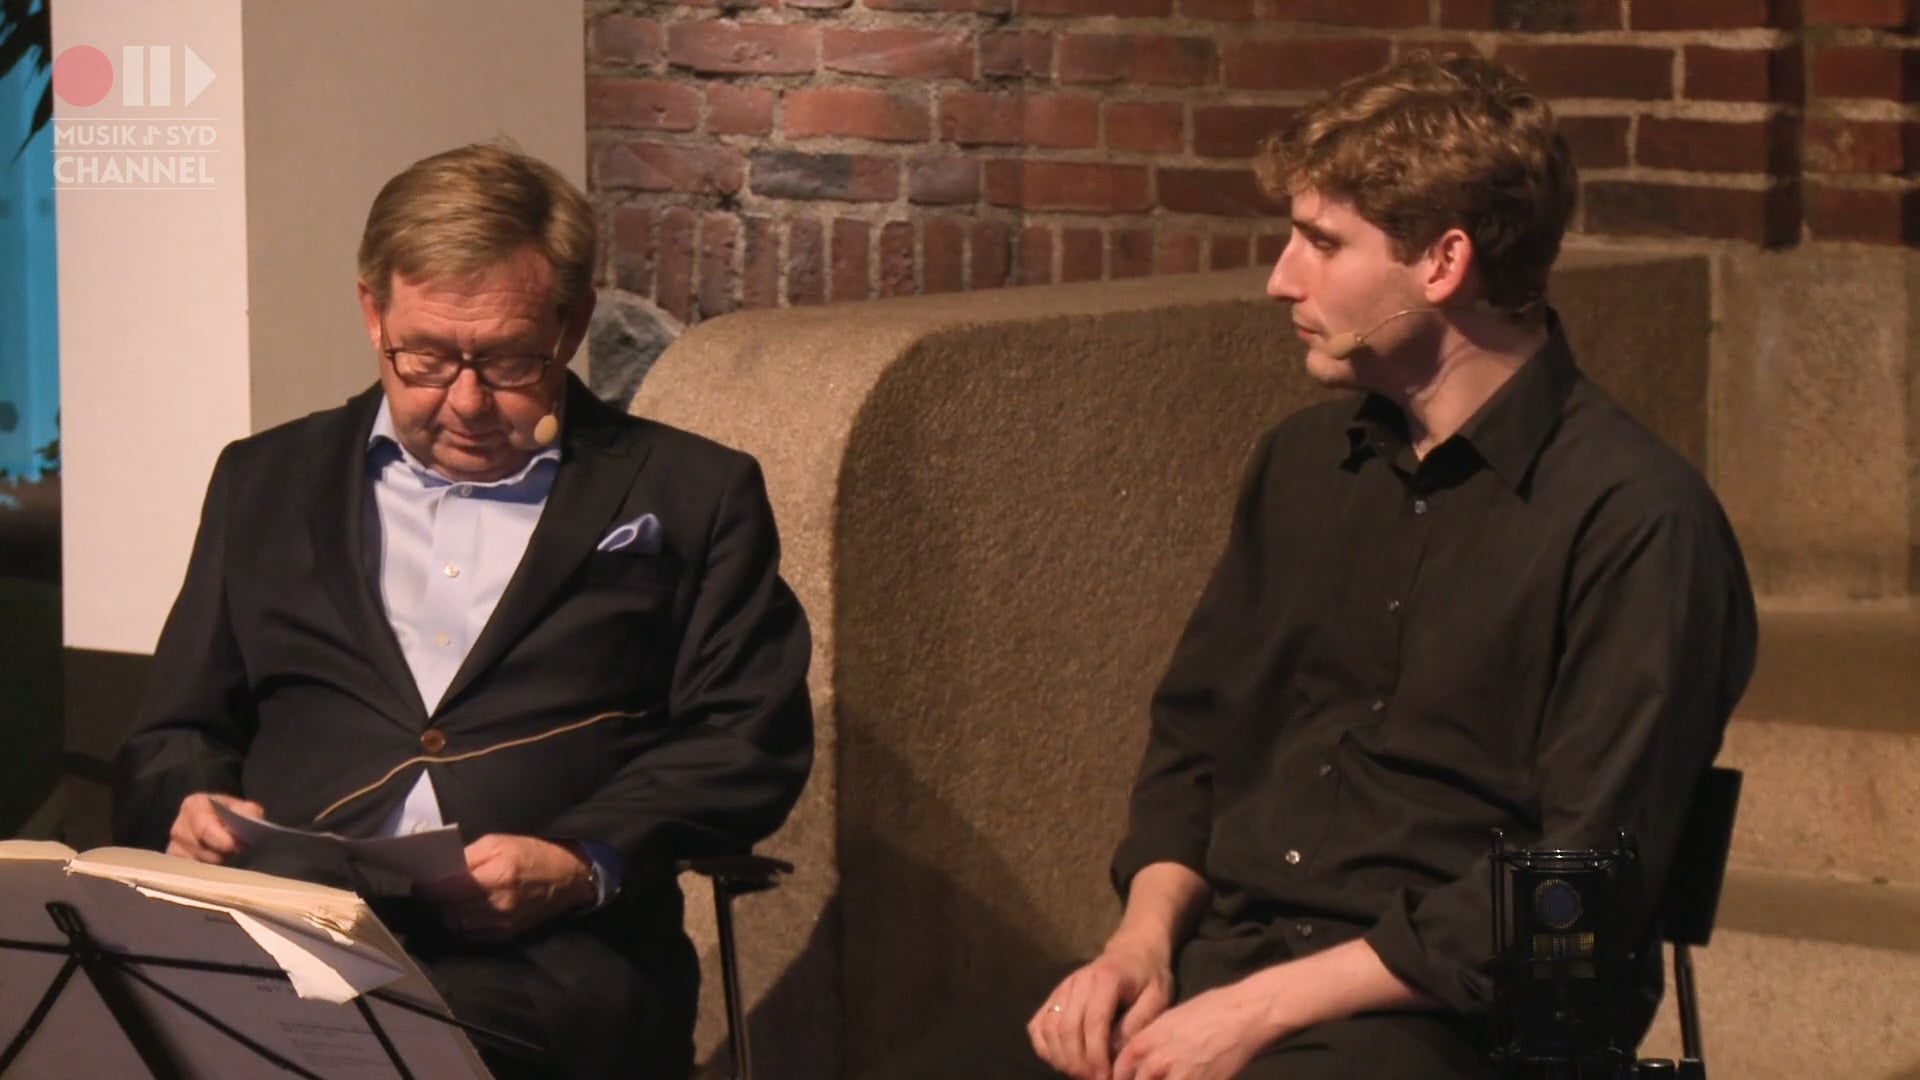 intervju_brantelid_martinsson